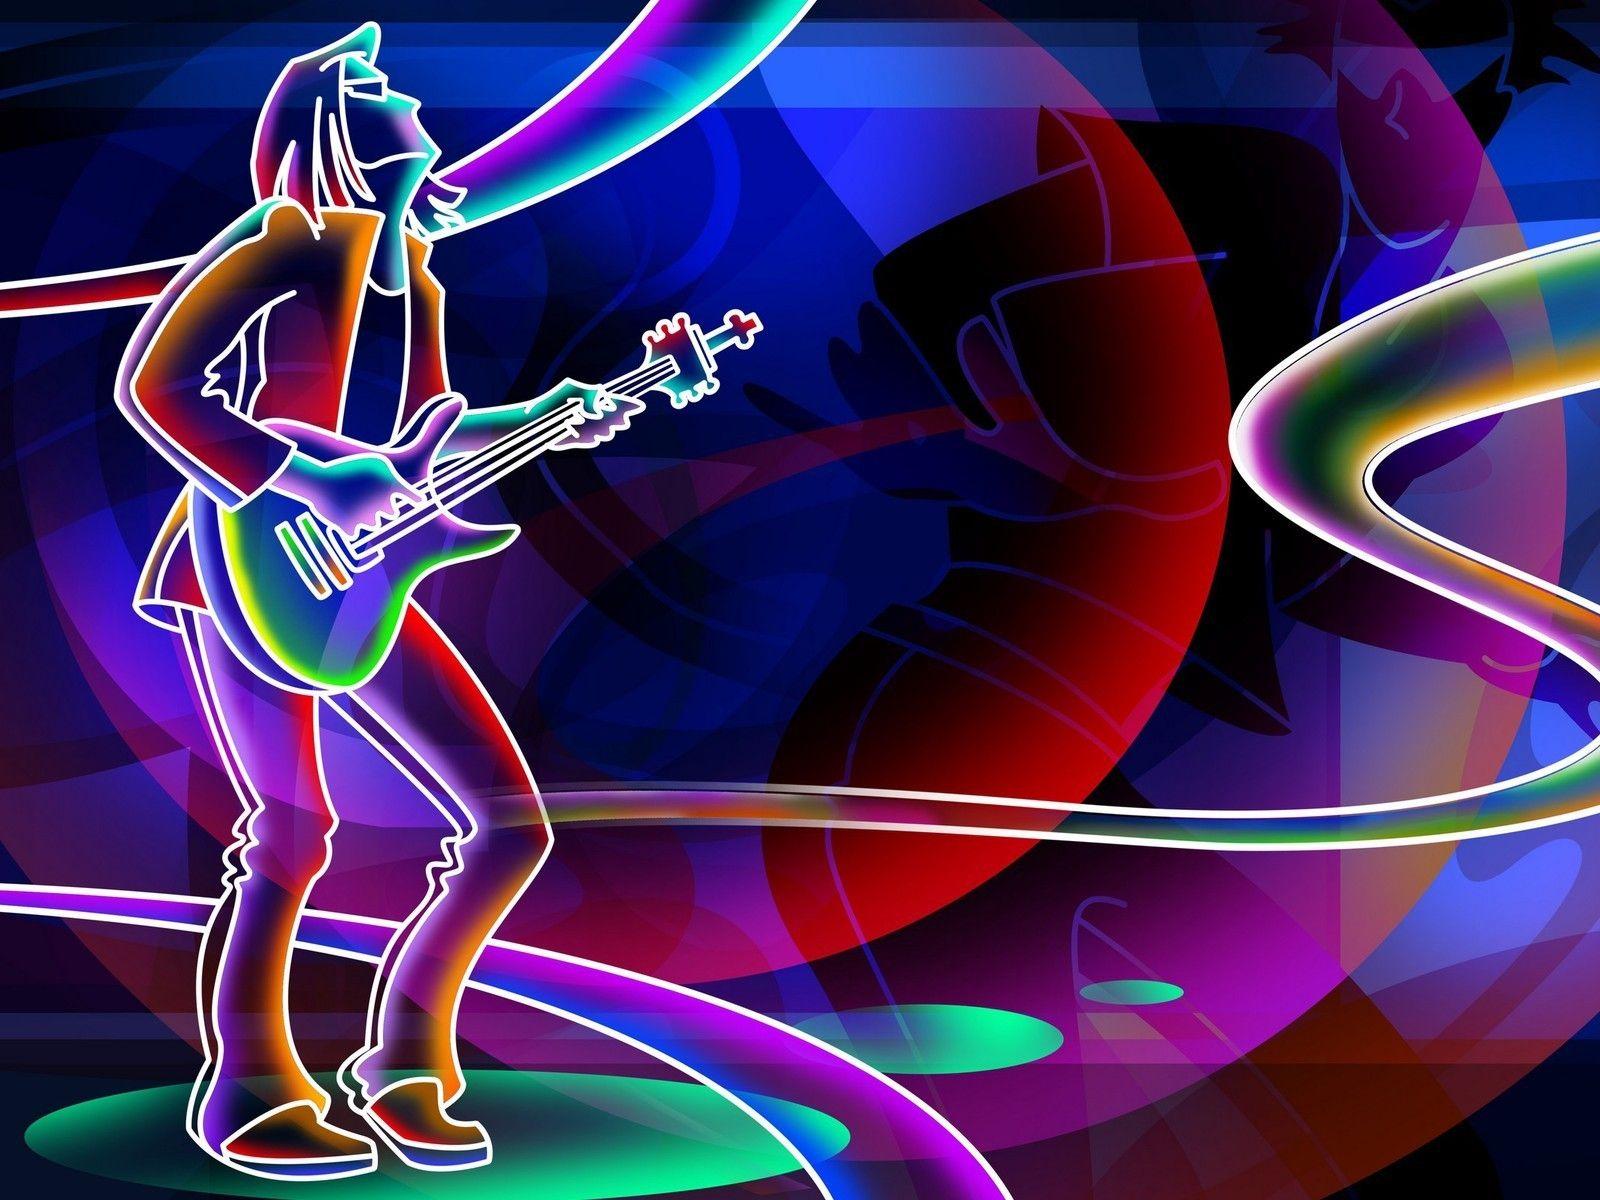 Jazz Abstract Neon Wallpaper drawing art Neon wallpaper Music 1600x1200